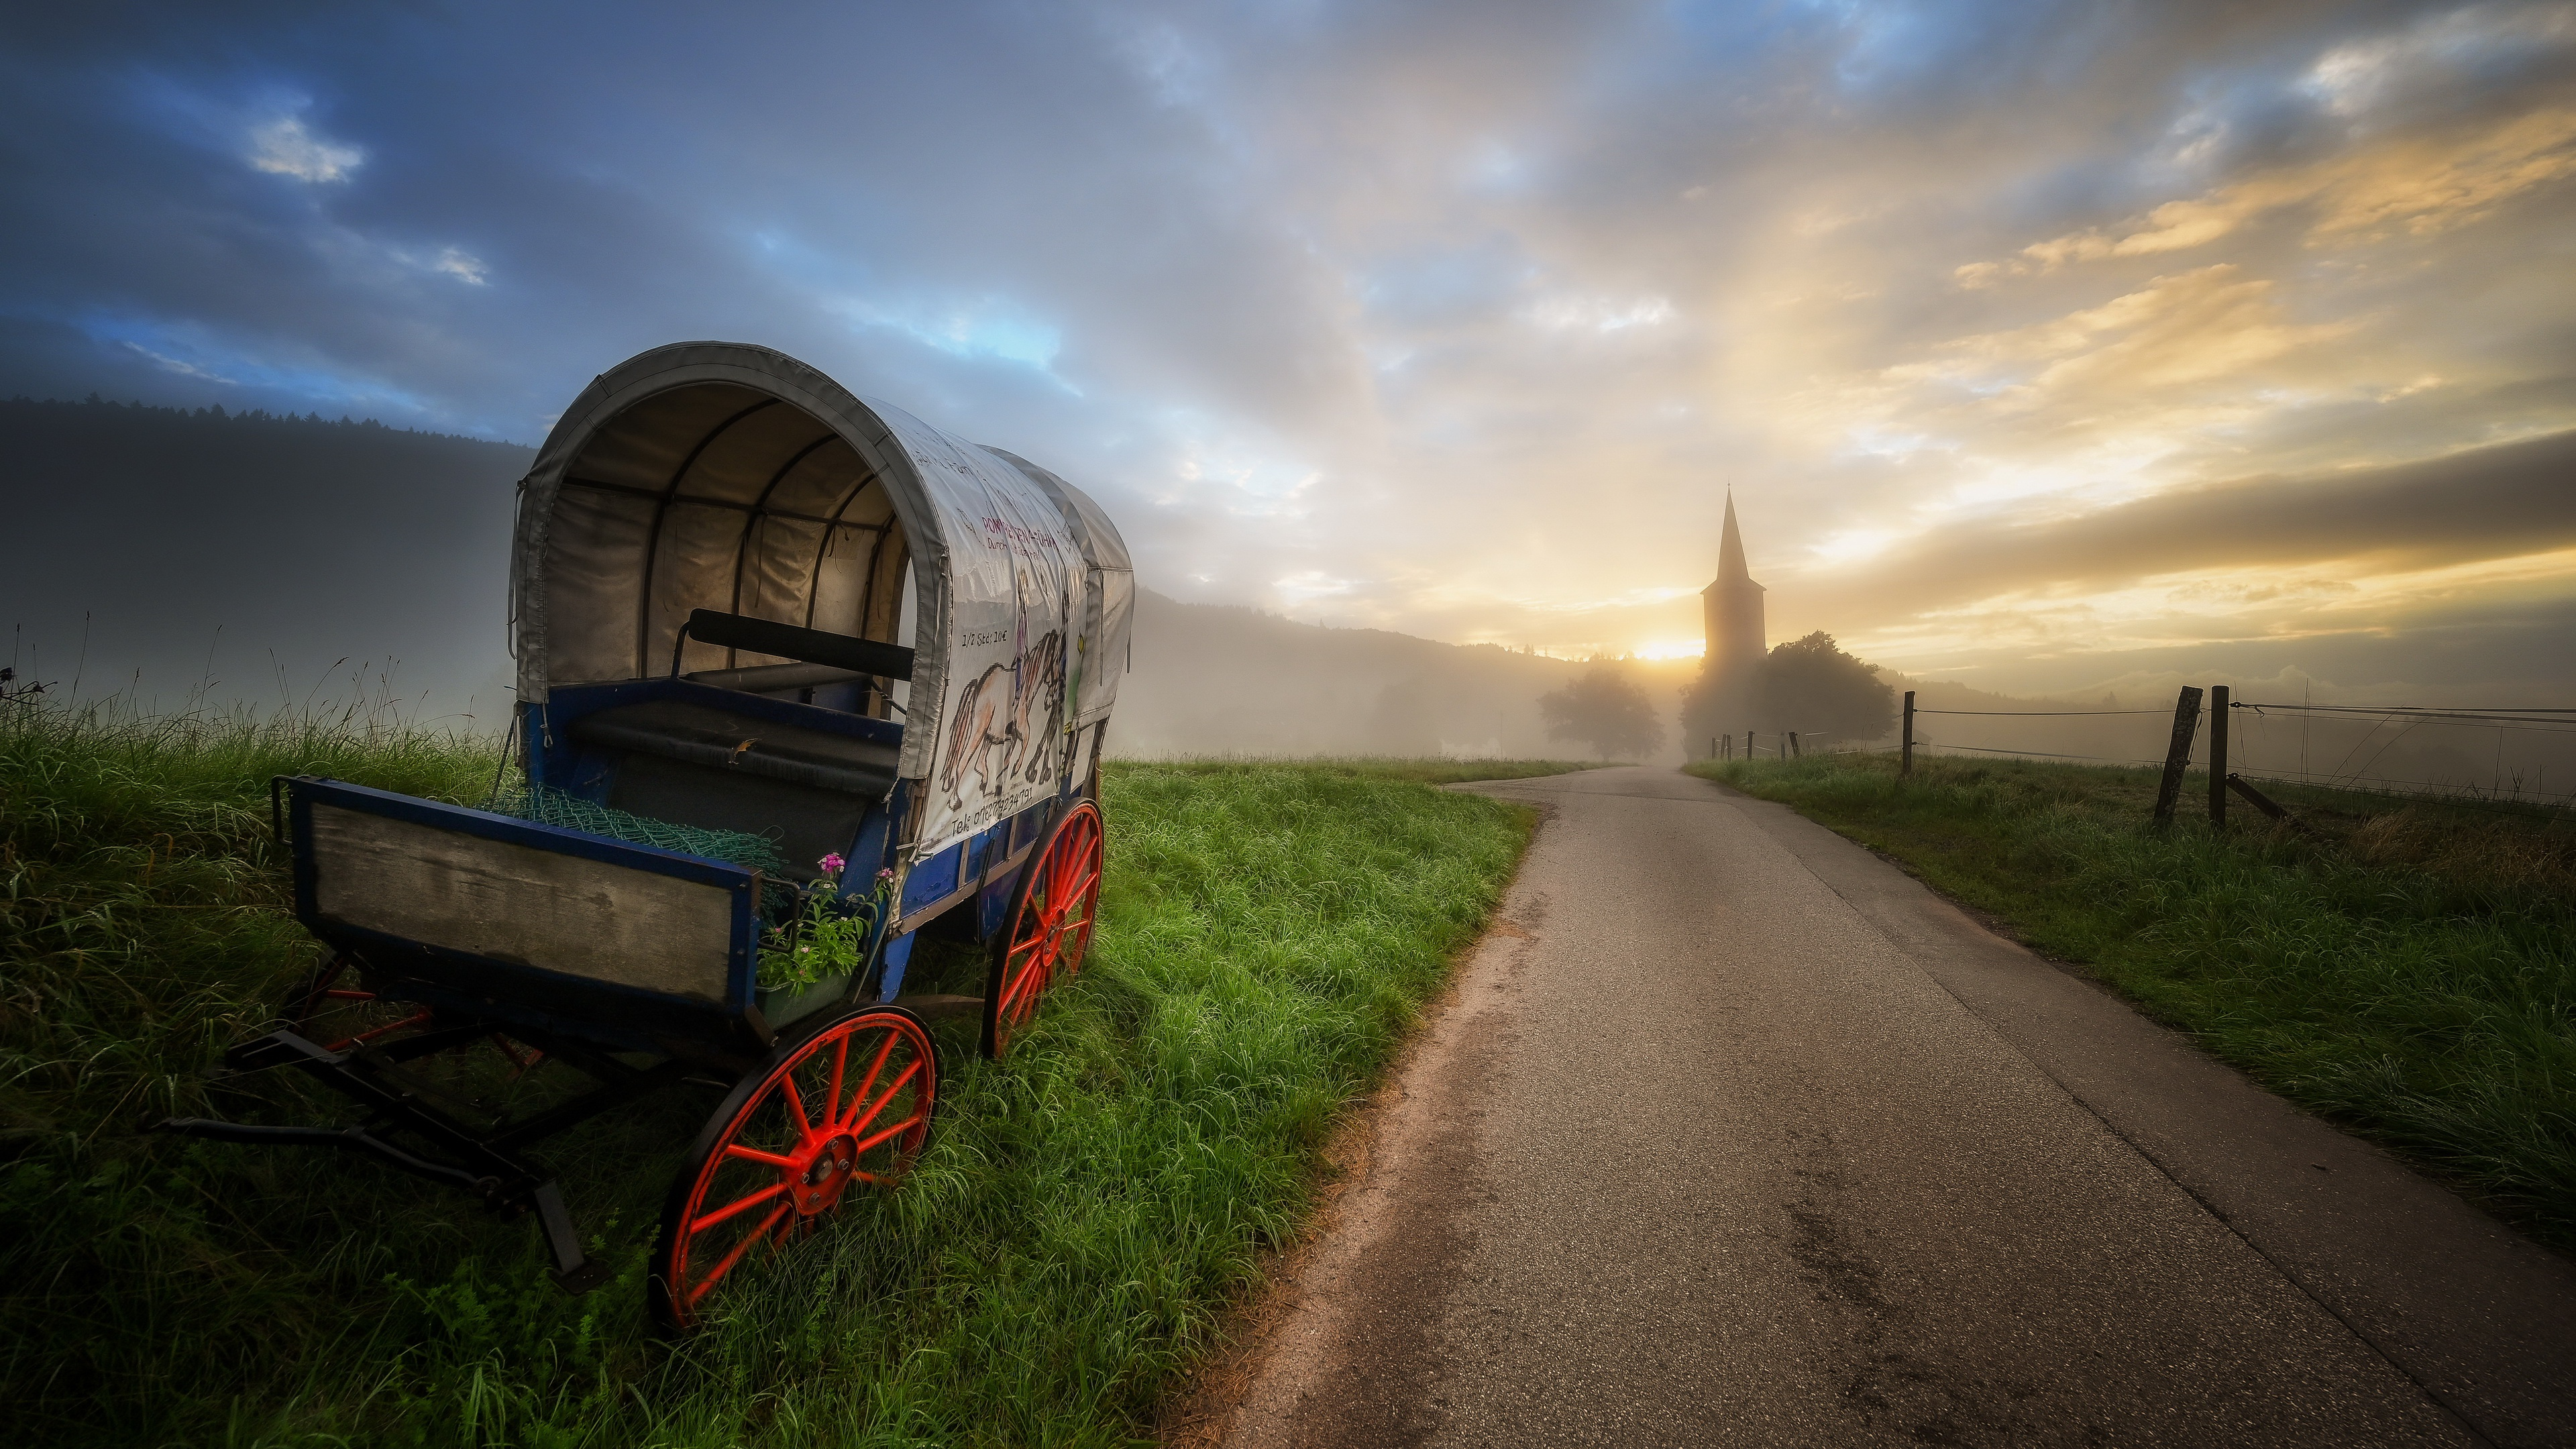 Vehicle Road Outdoors Sky Landscape Sunlight 3840x2160